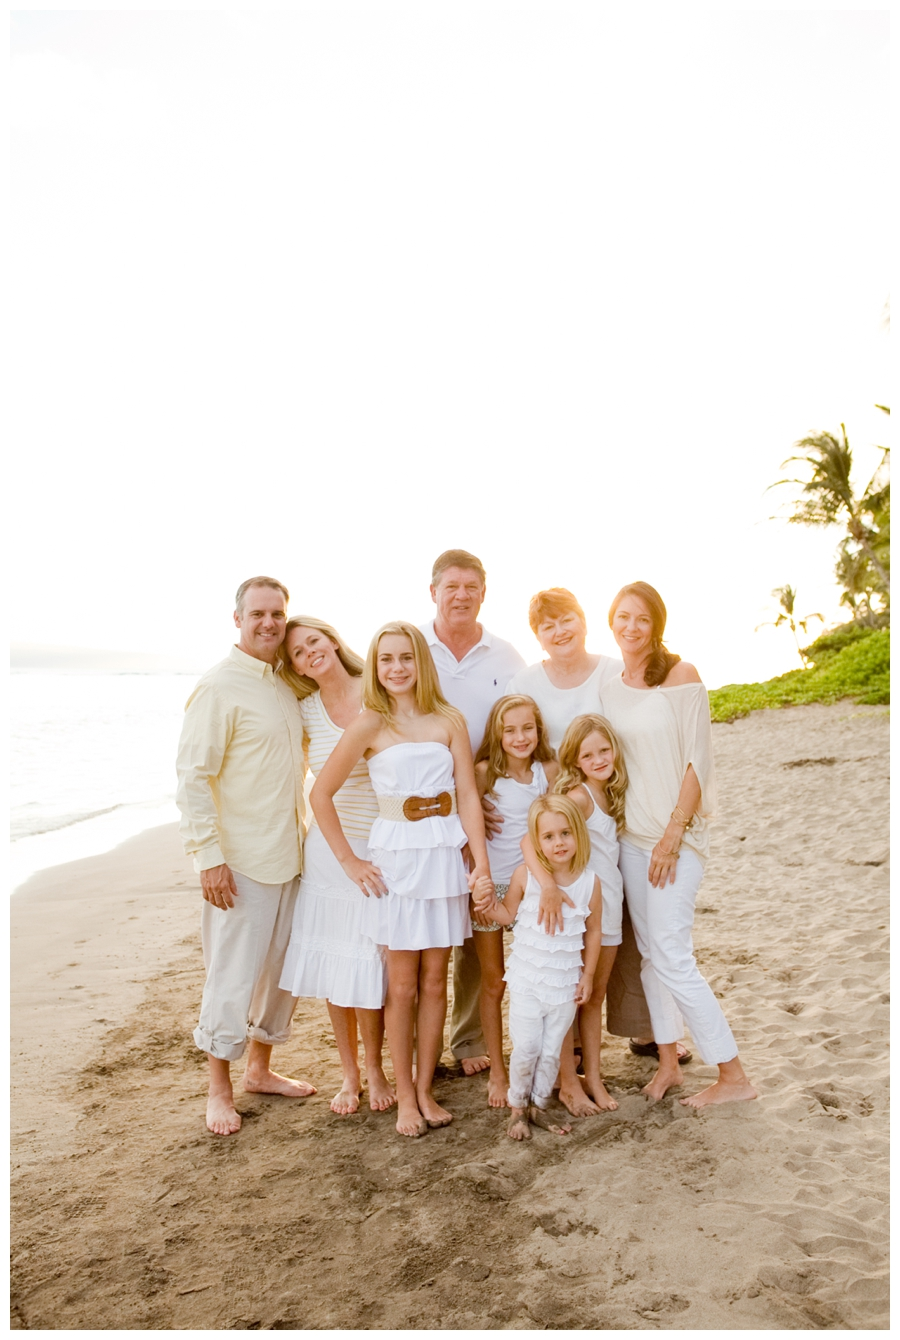 sandiegofamilyphotography-209.jpg